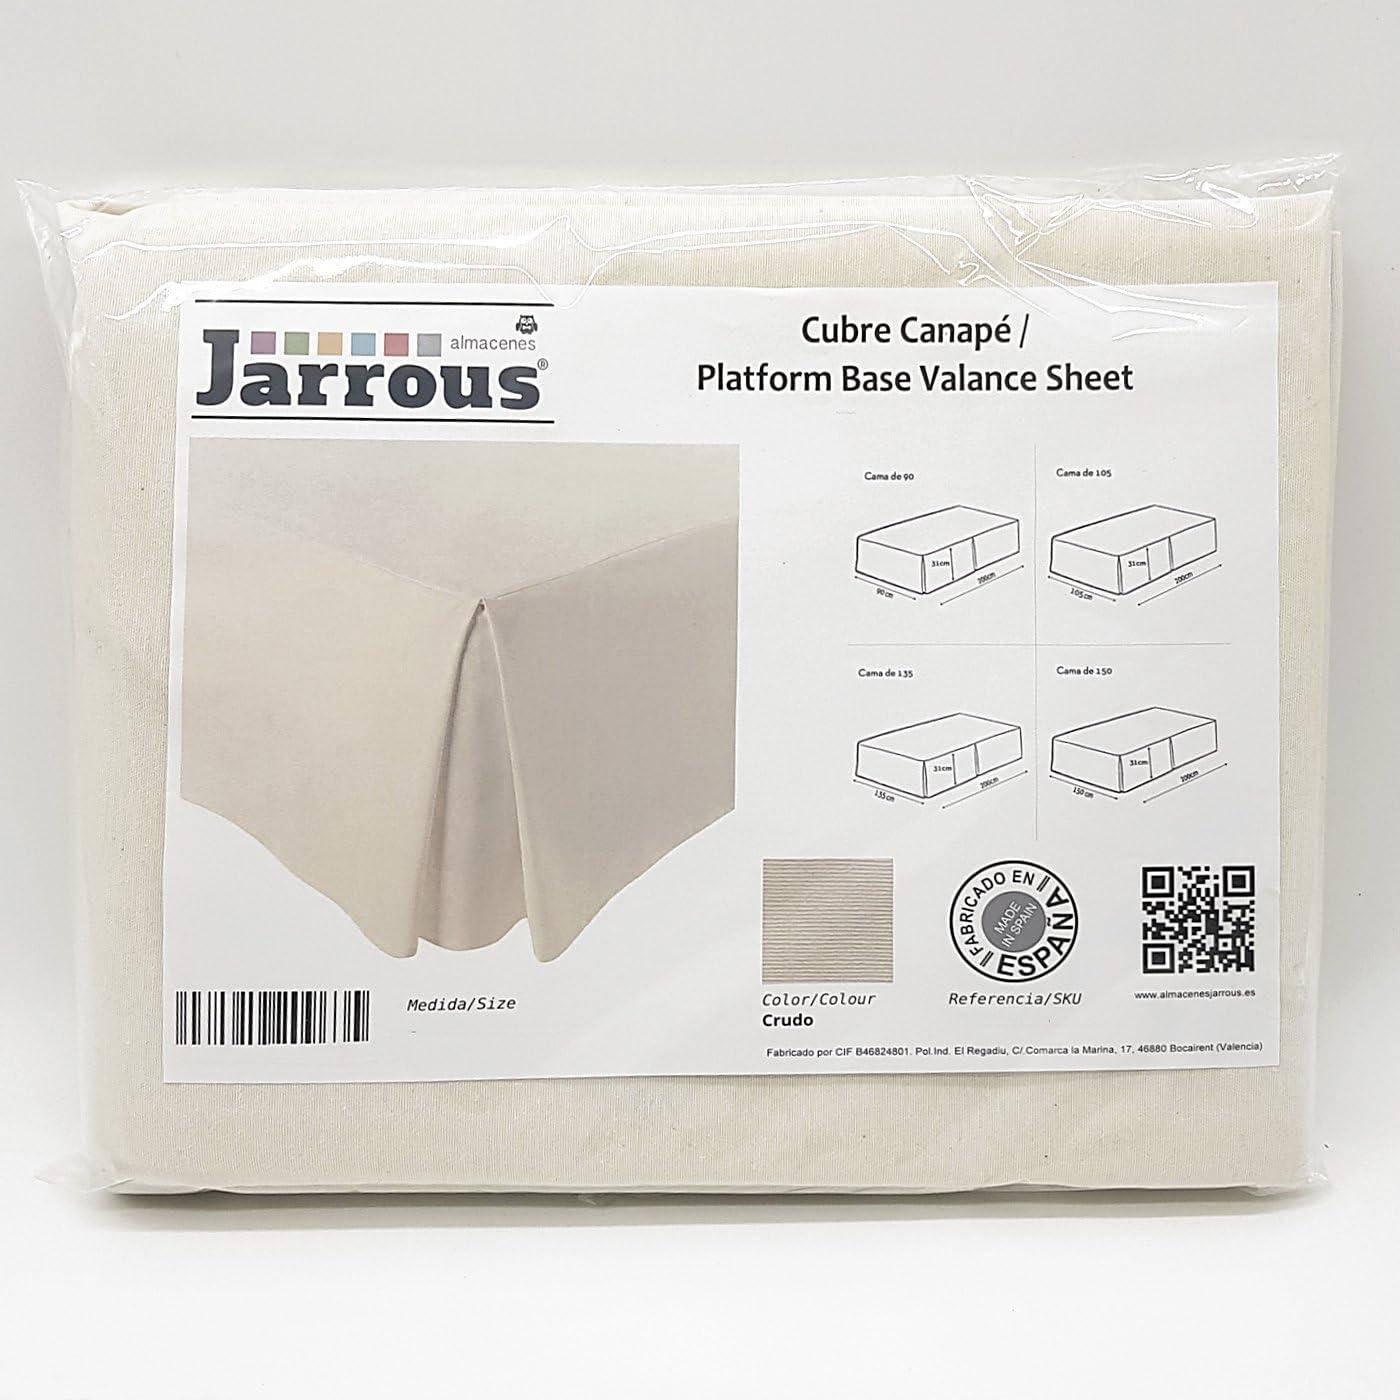 Jarrous Cubre Canapé Modelo Pierre, Color Crudo, Medida para Cama de 150